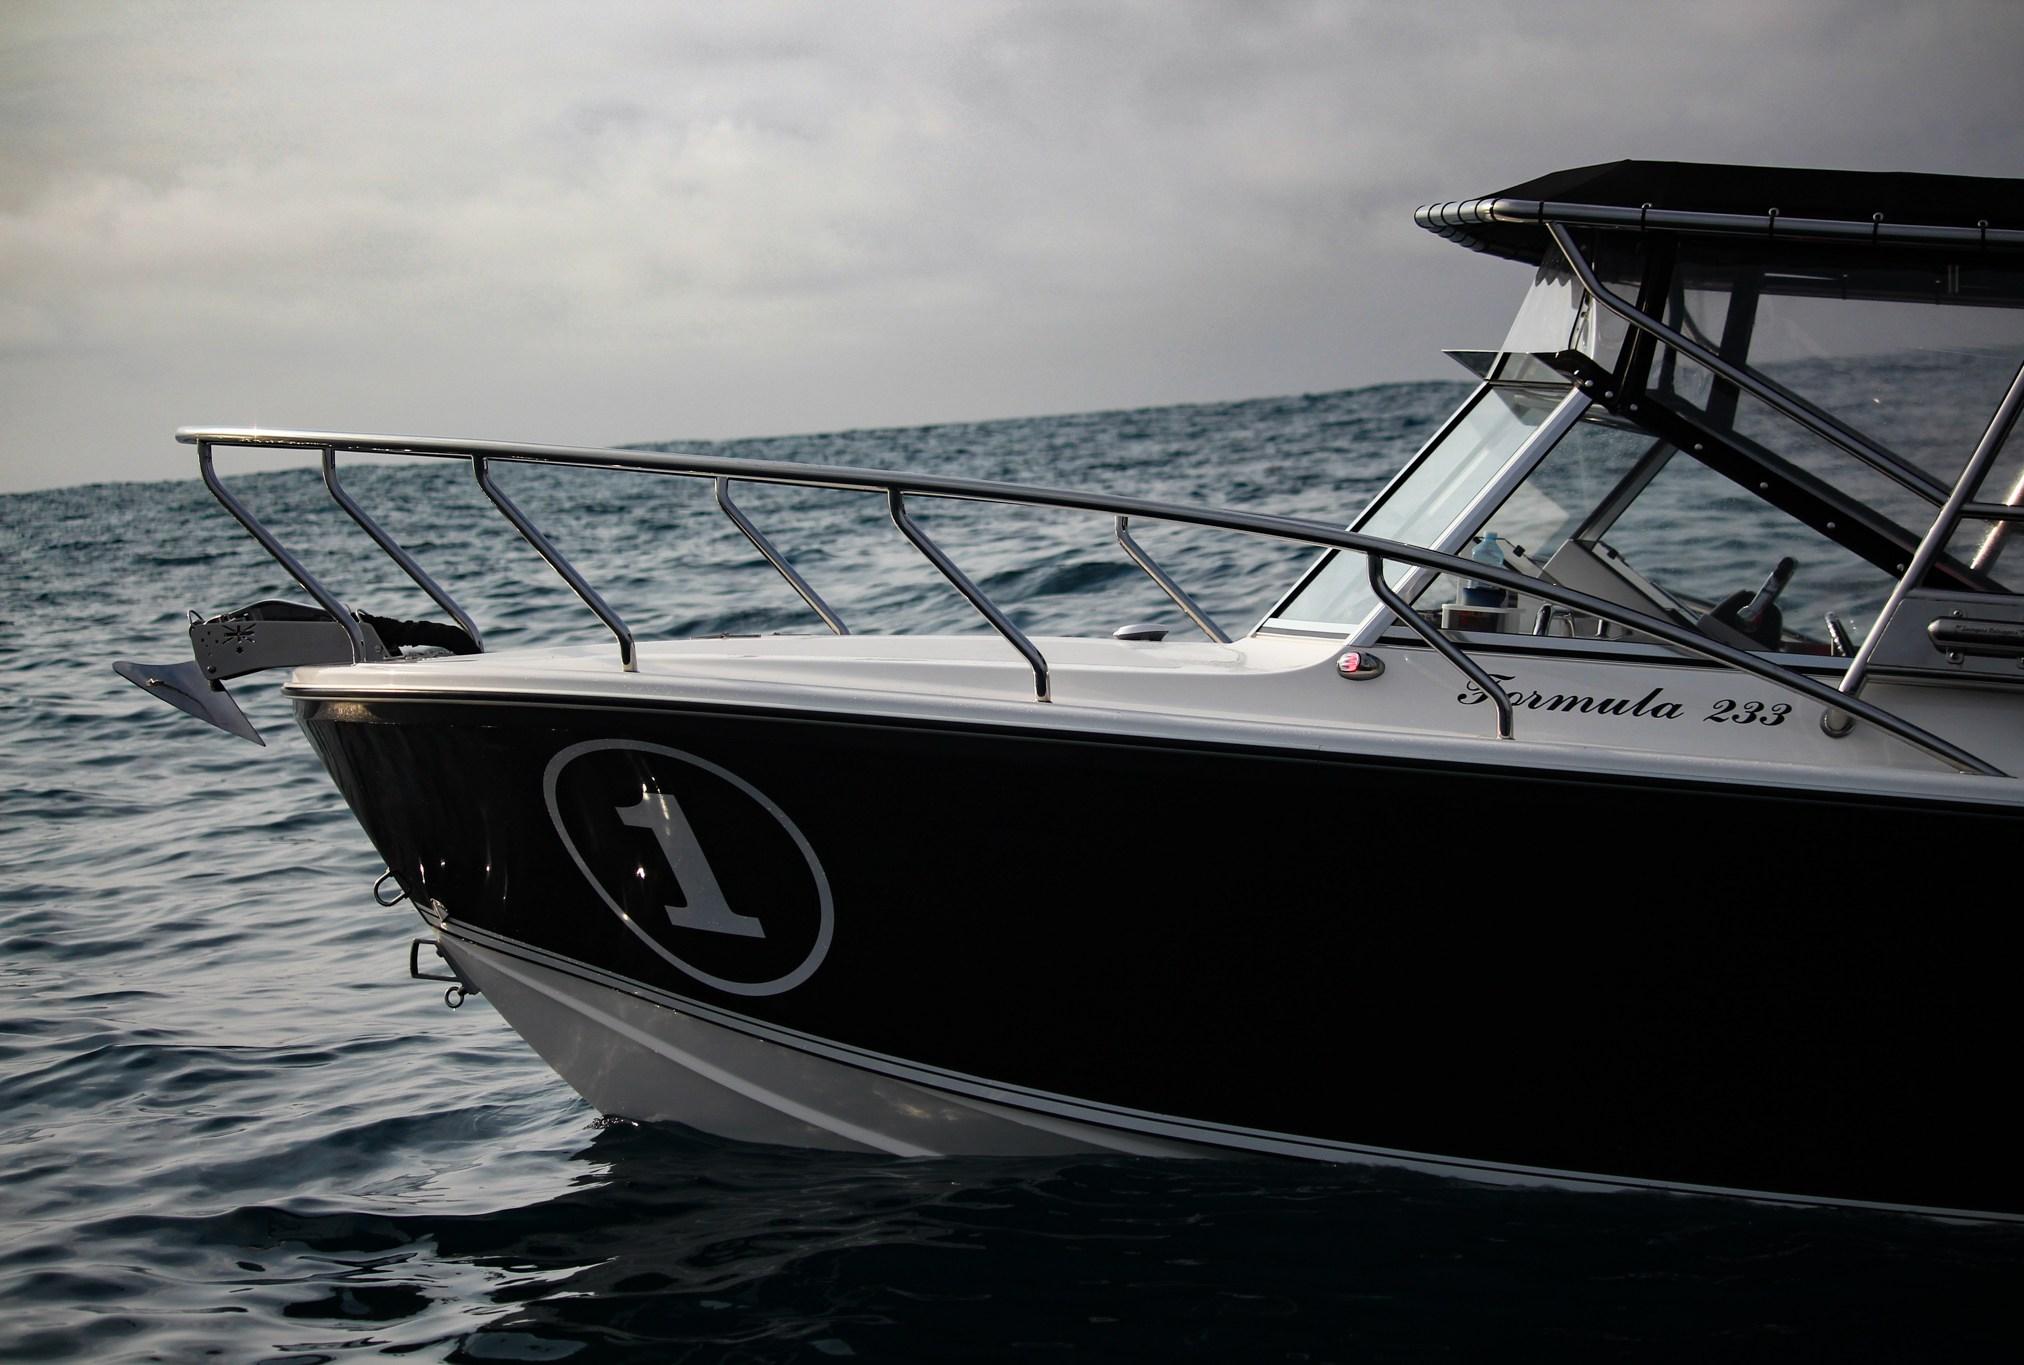 Edencraft 233 Formula Classic at rest offshore